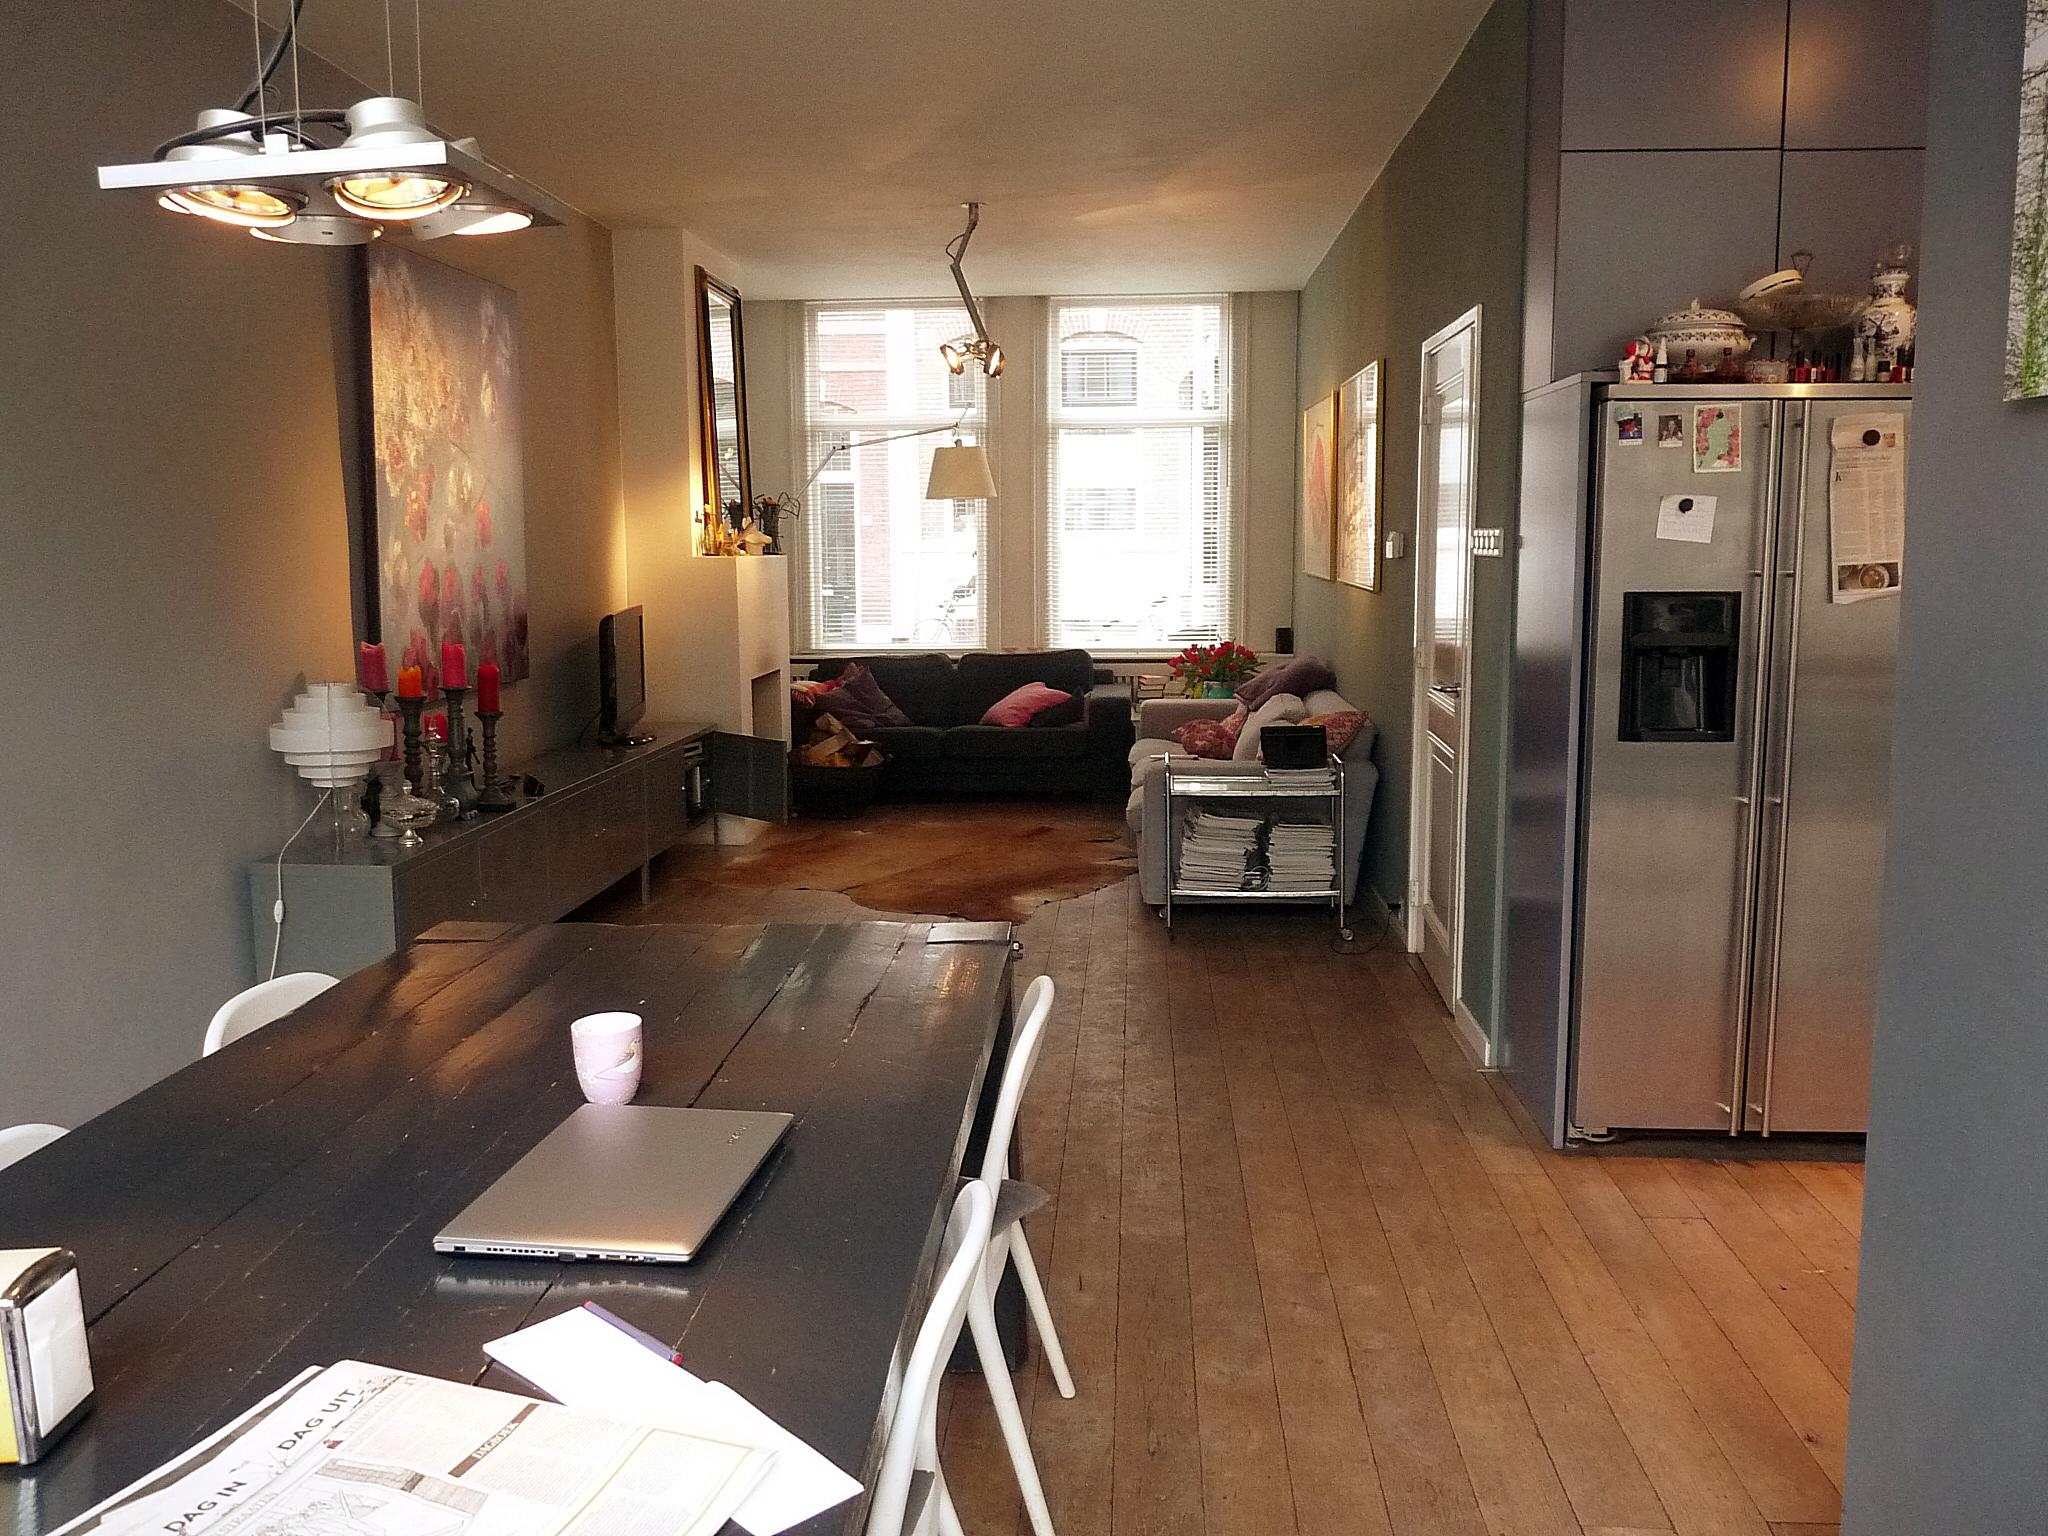 Livingroom of the house